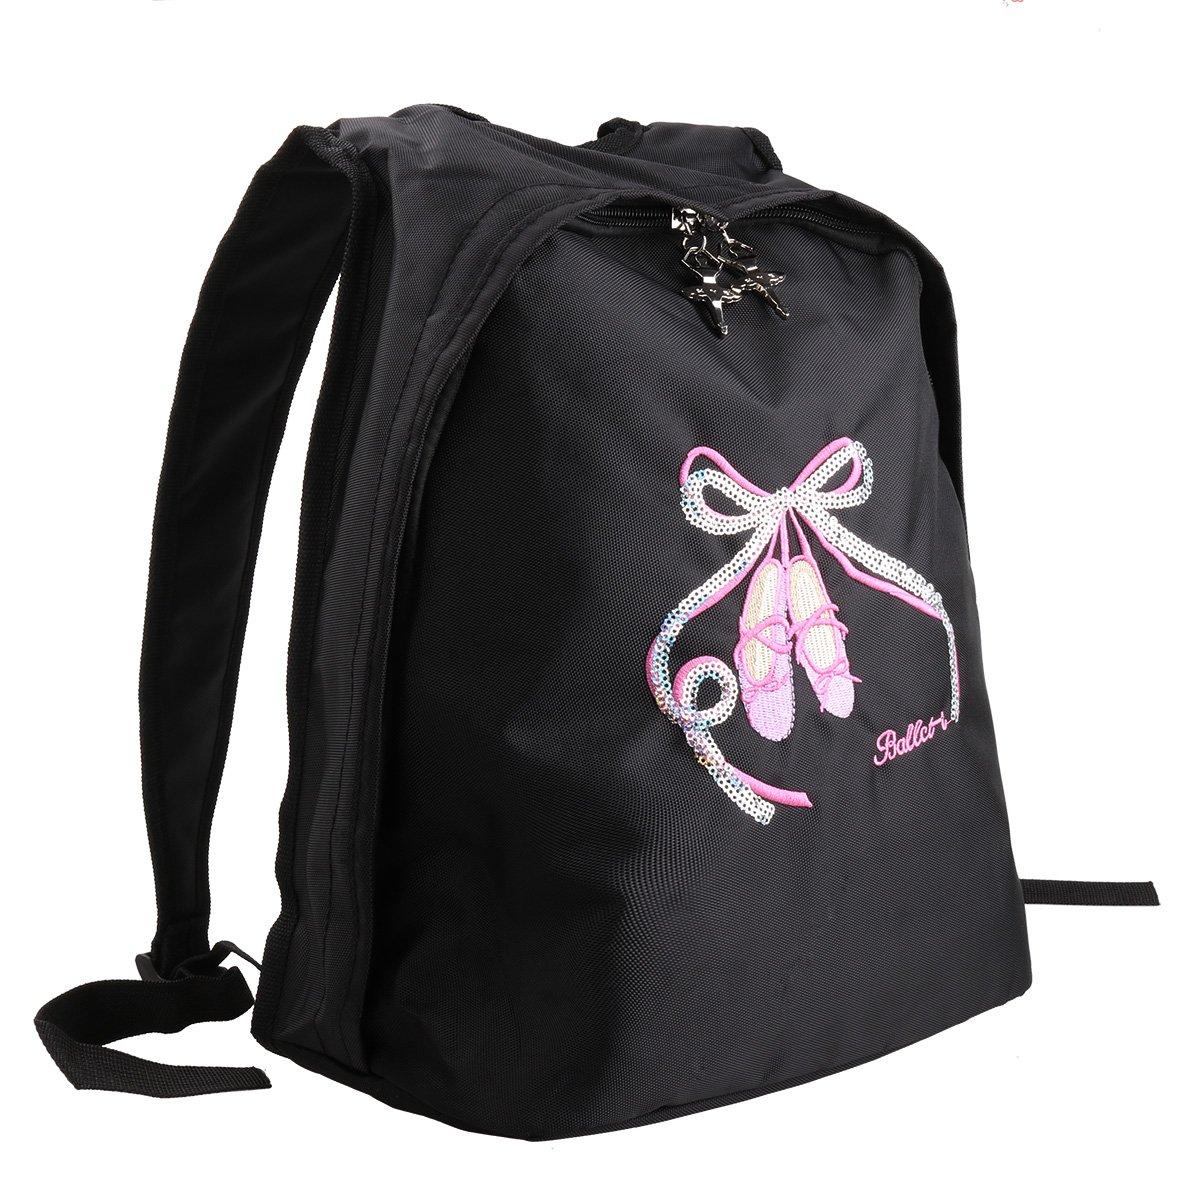 iEFiEL Girls Big Capacity Ballet Dance Tote Bag Travel Carry Shoulder Bag Black One Size by iEFiEL